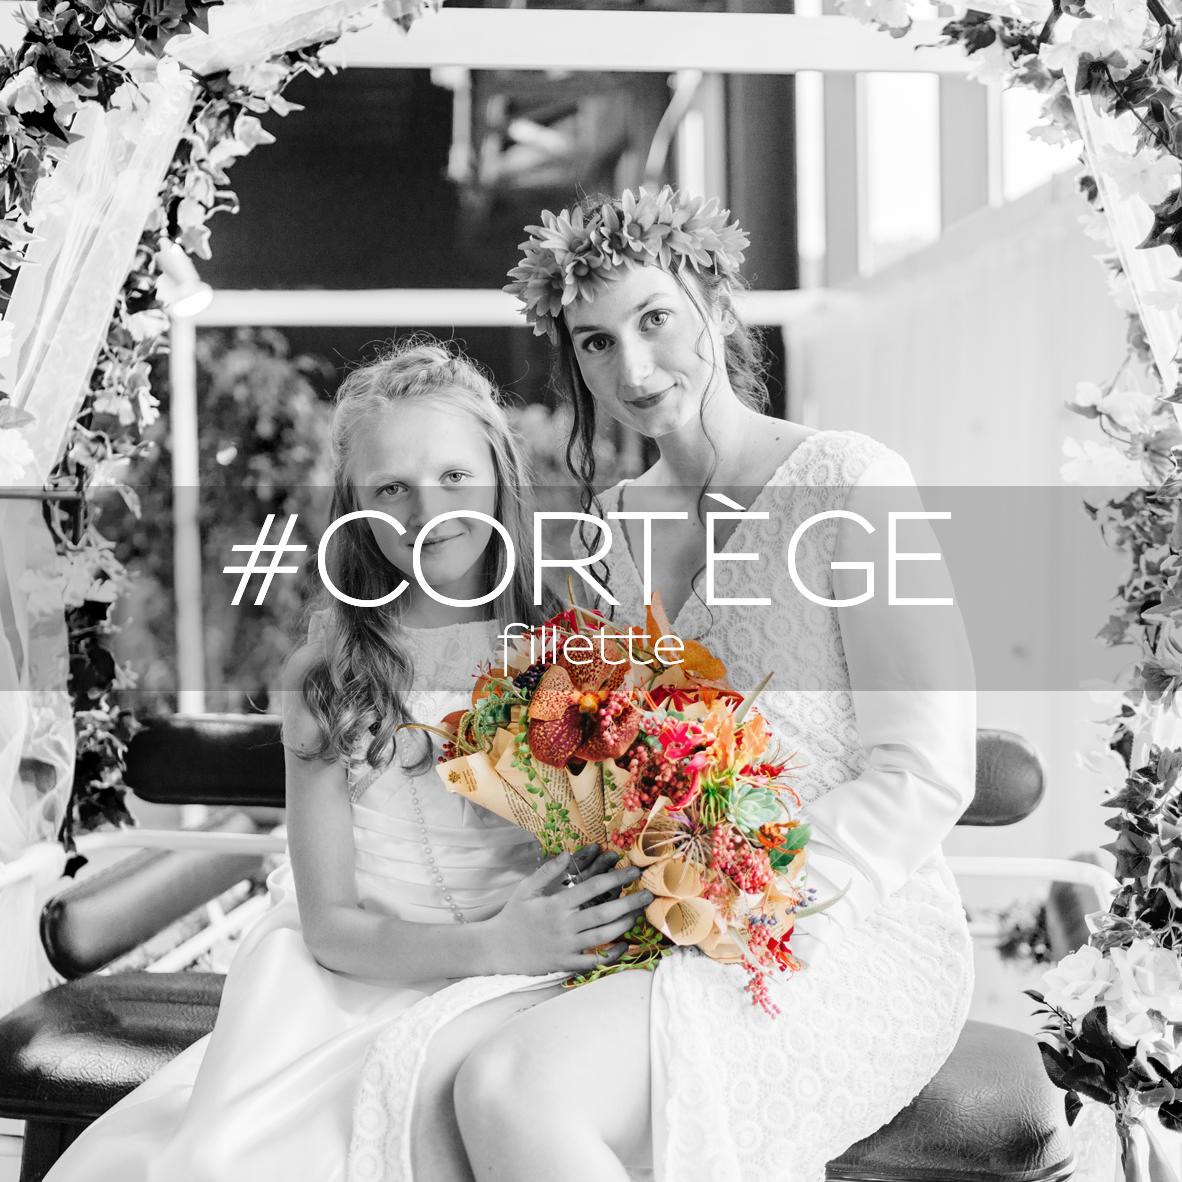 CORTEGE - Fabienne Dimanov mariage